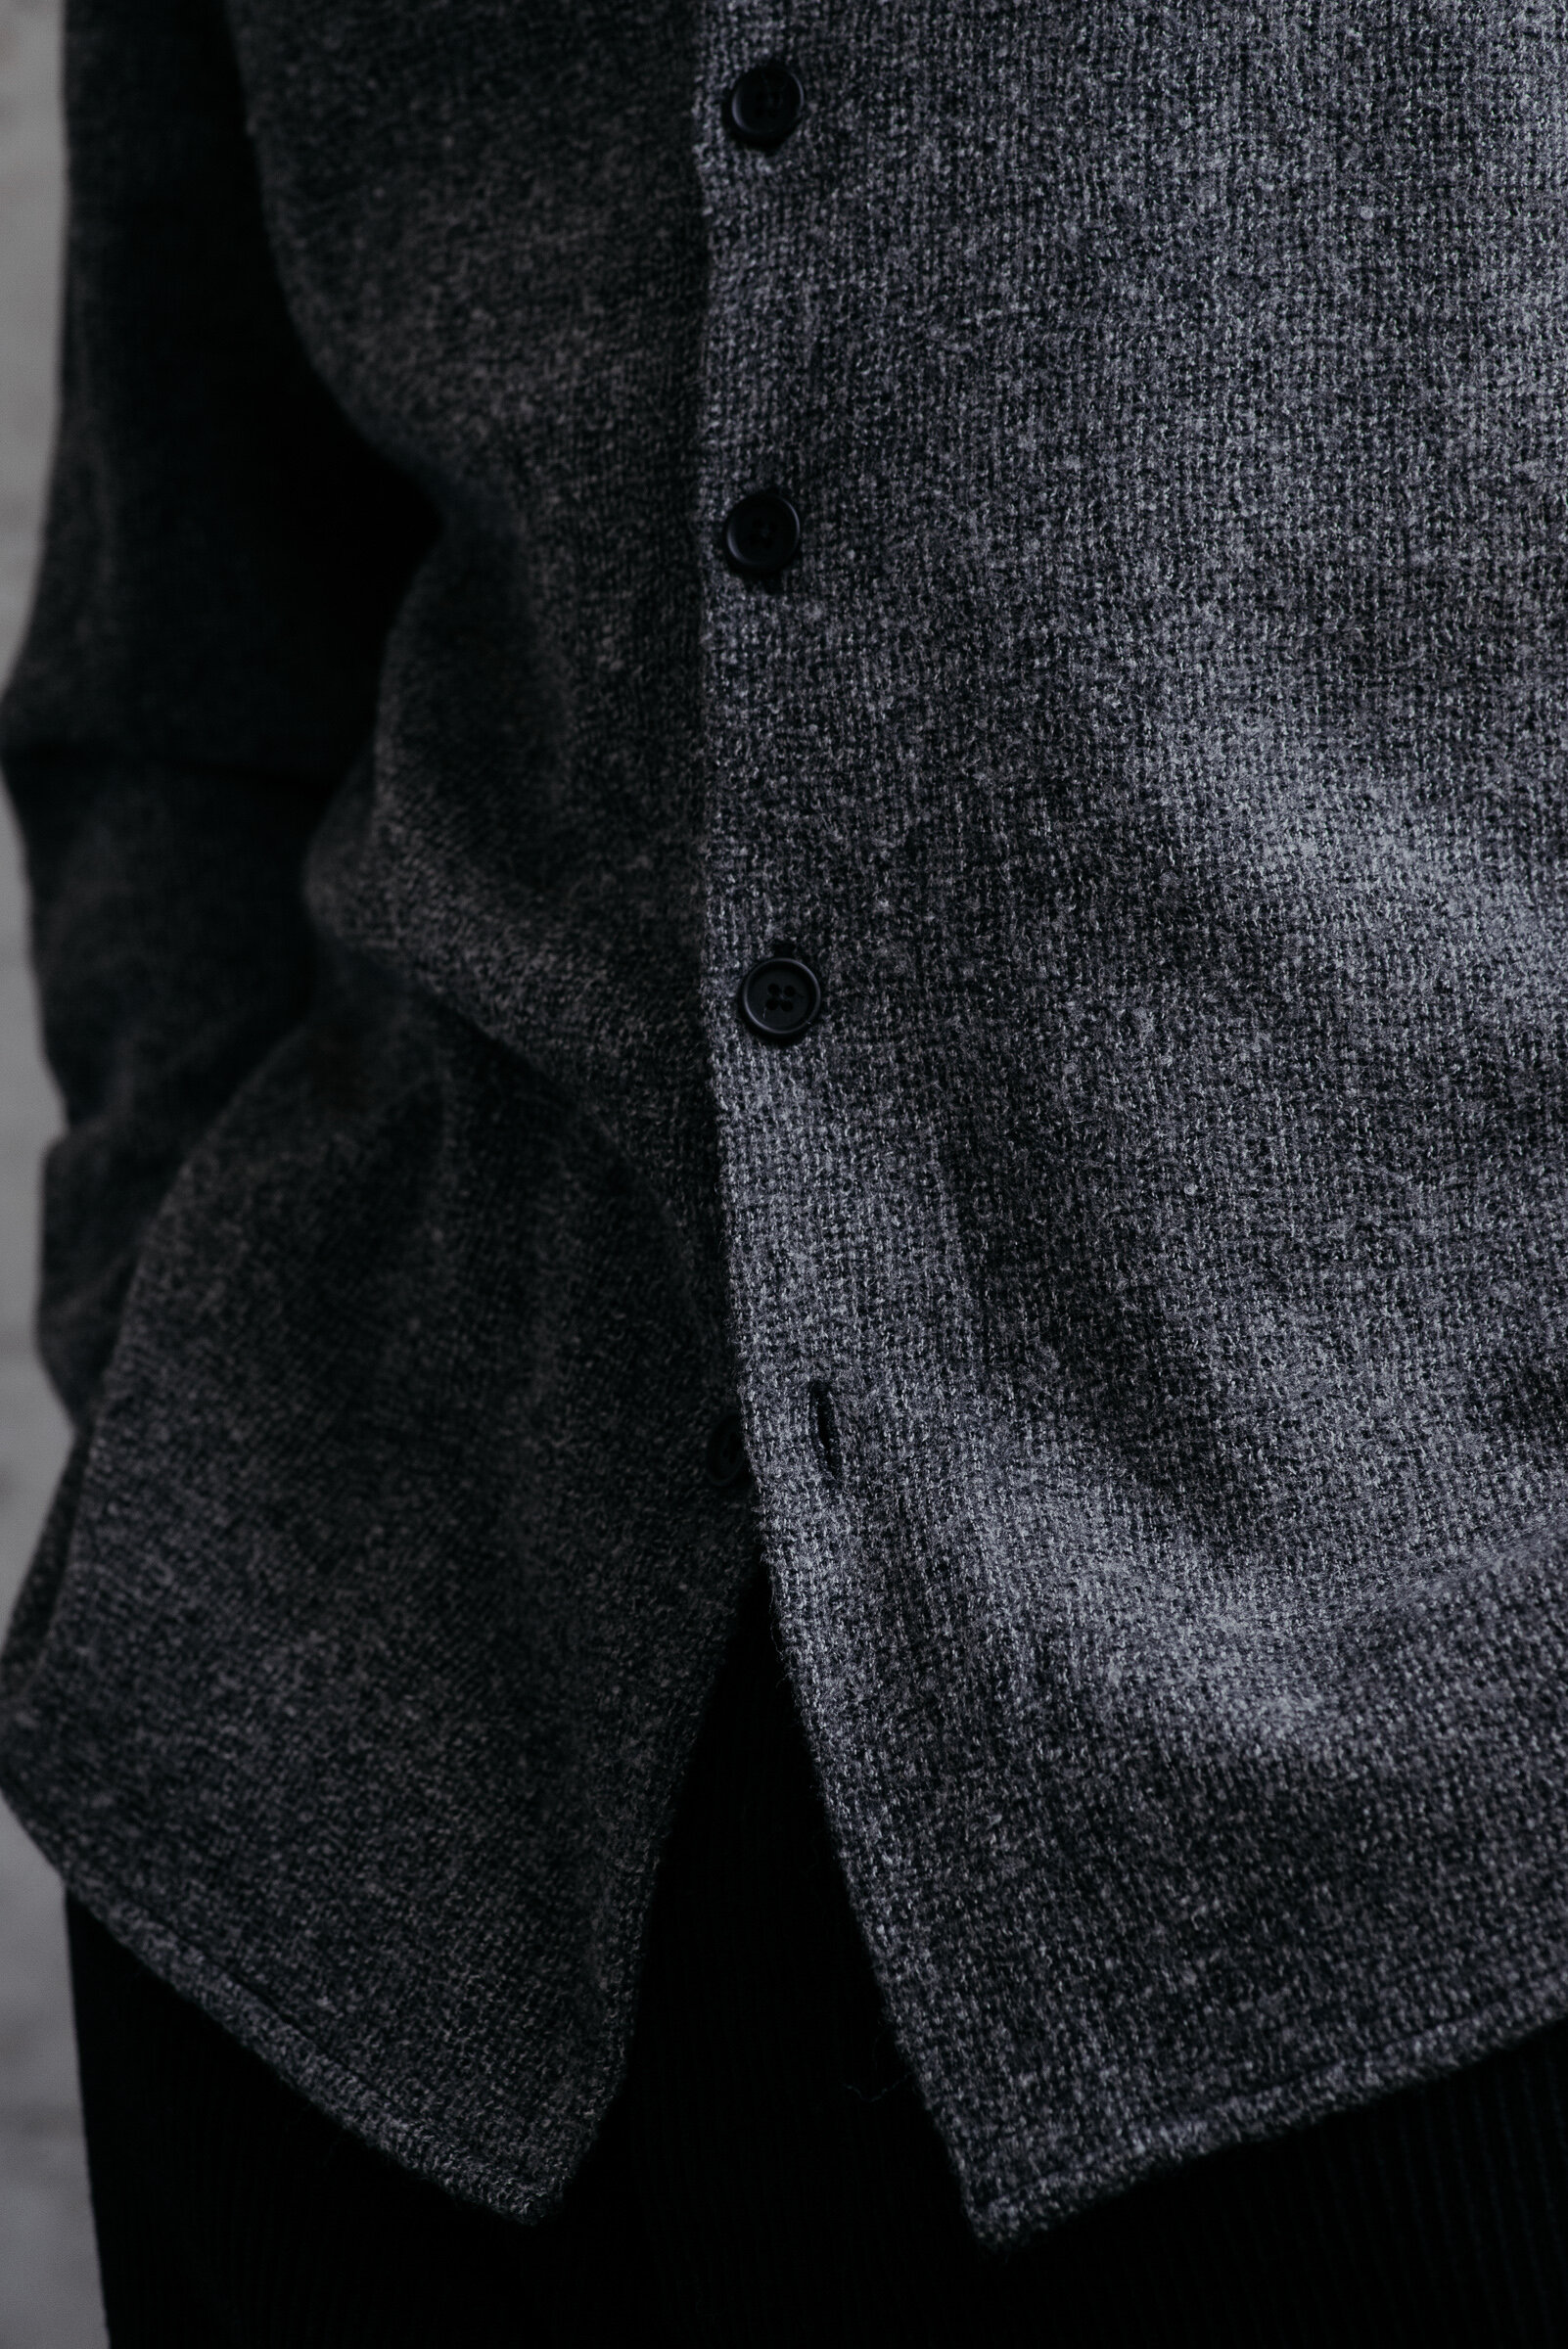 evan-kinori-band-collar-shirt-wool-gauze-woven-in-italy-5